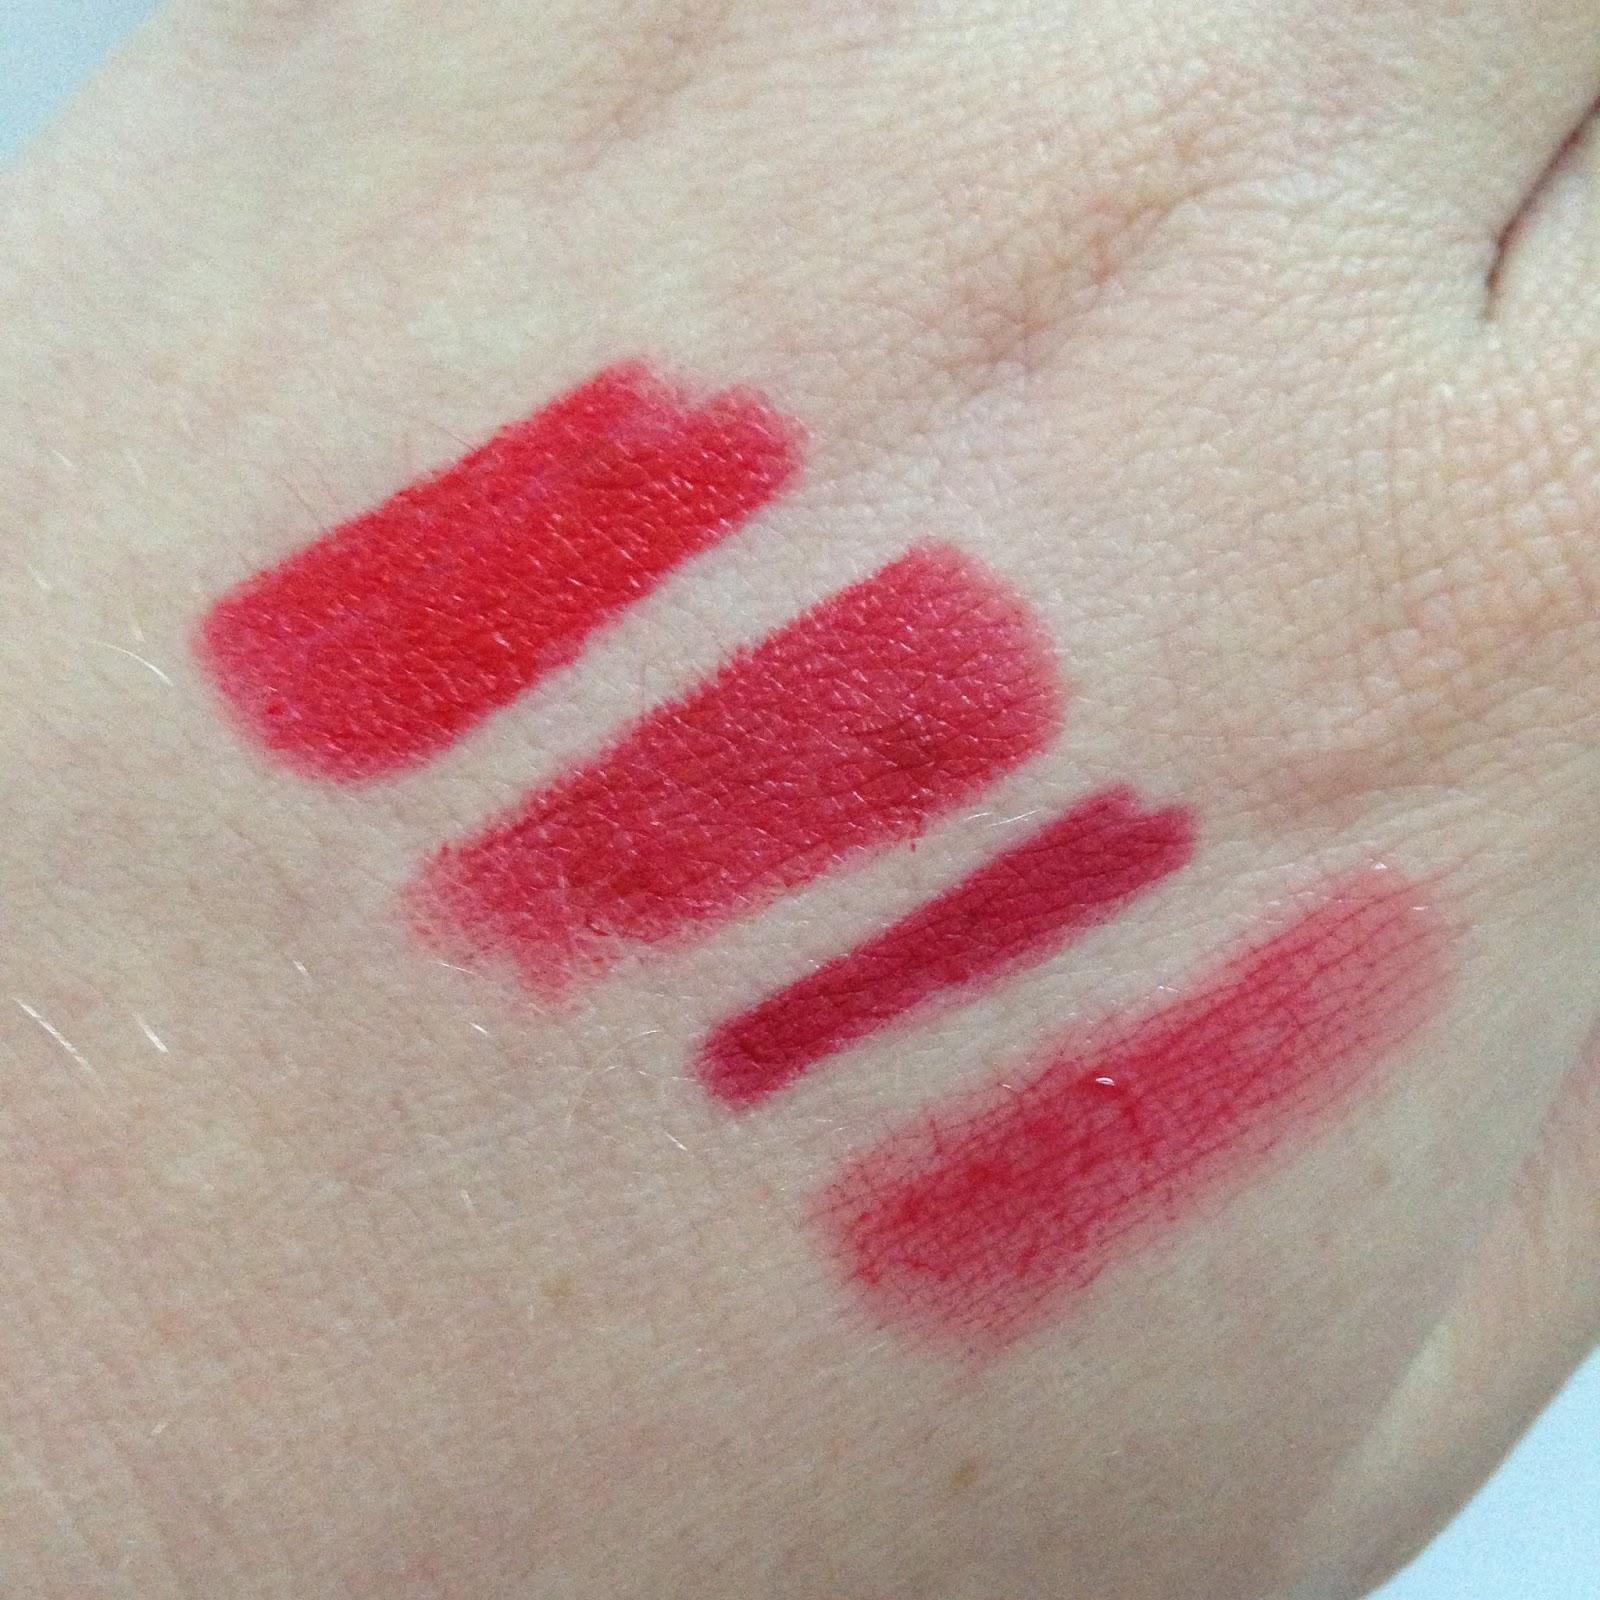 red lipstick swatch